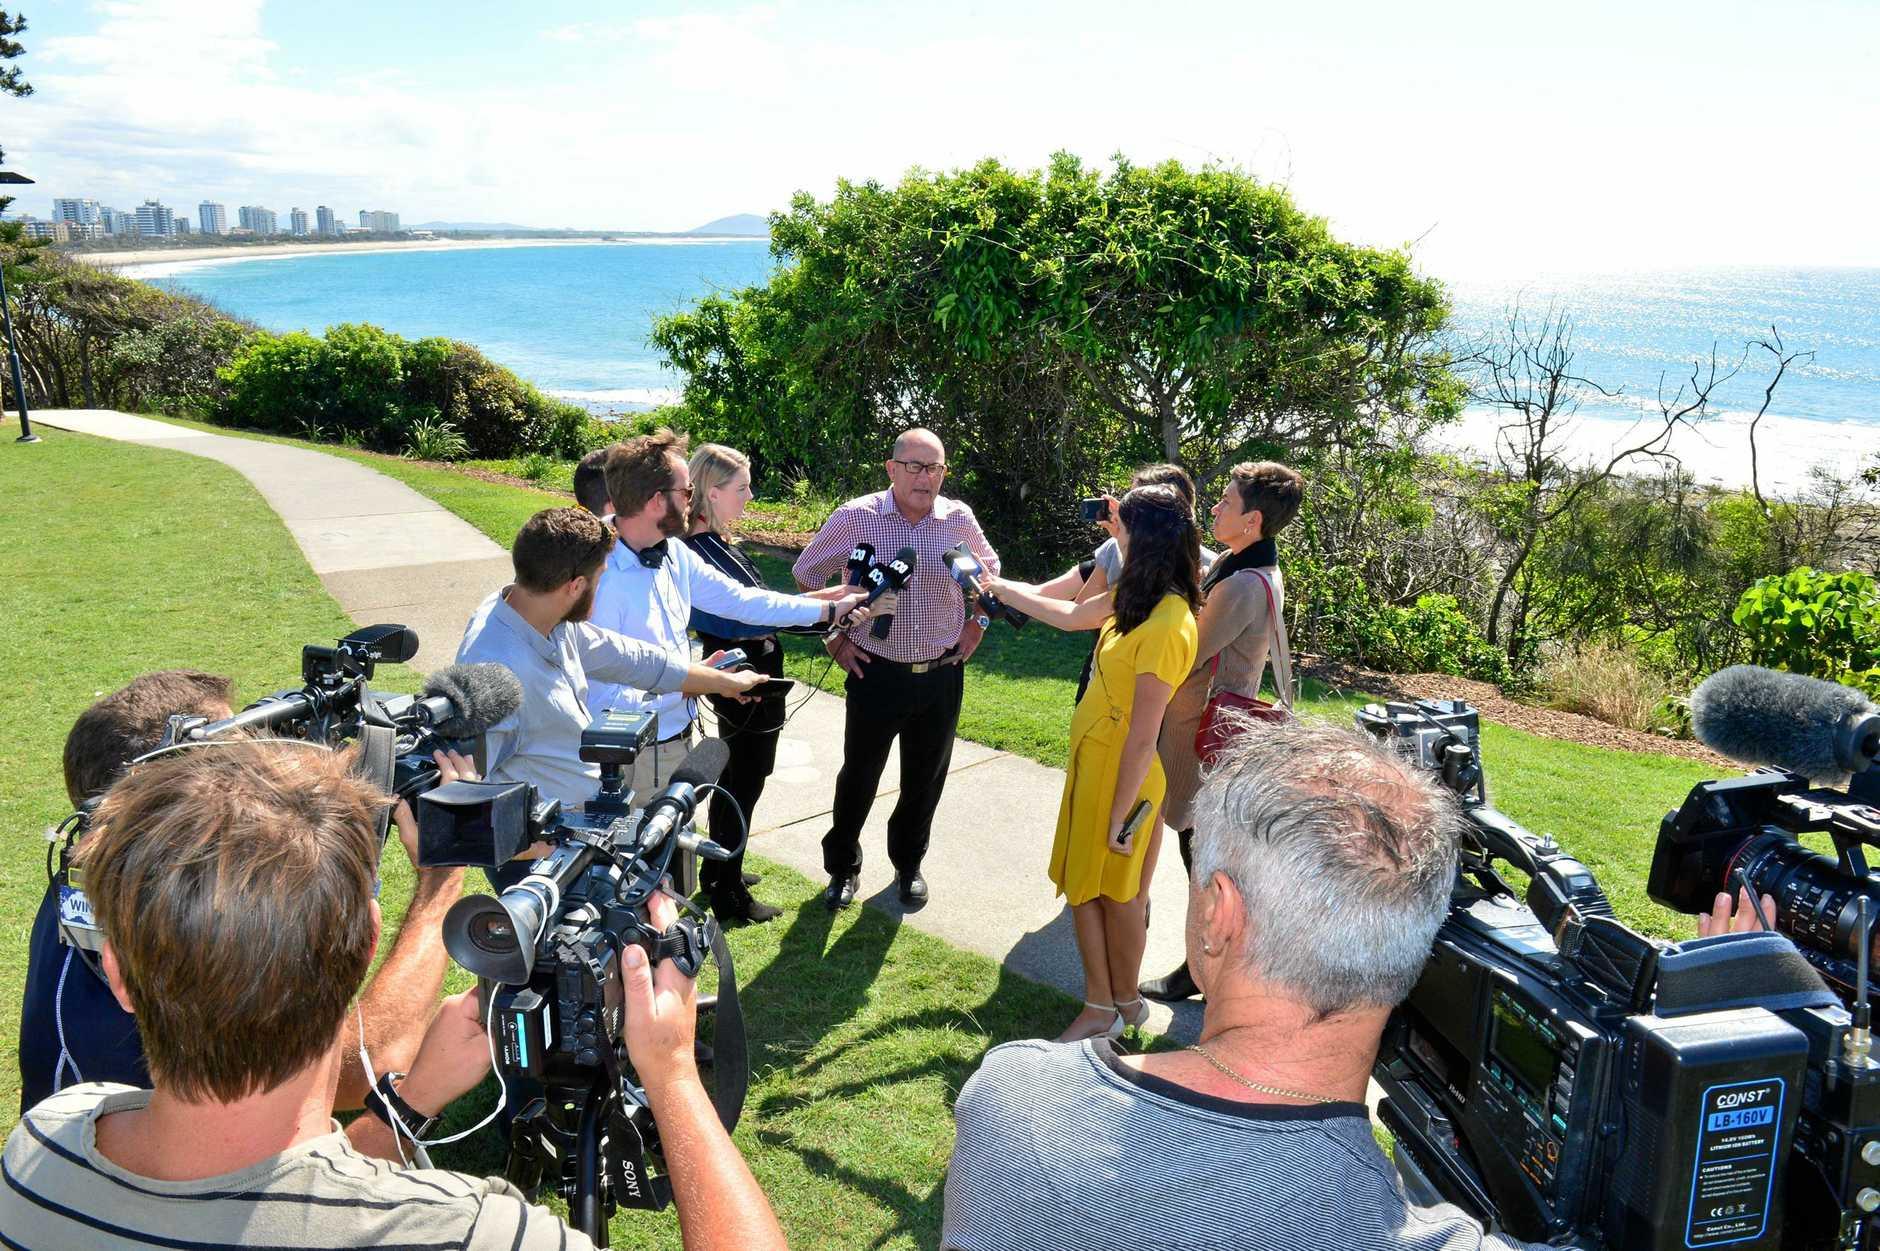 Ashley Robinson speaks about Brendon Johnsson's drug arrest in Bali.